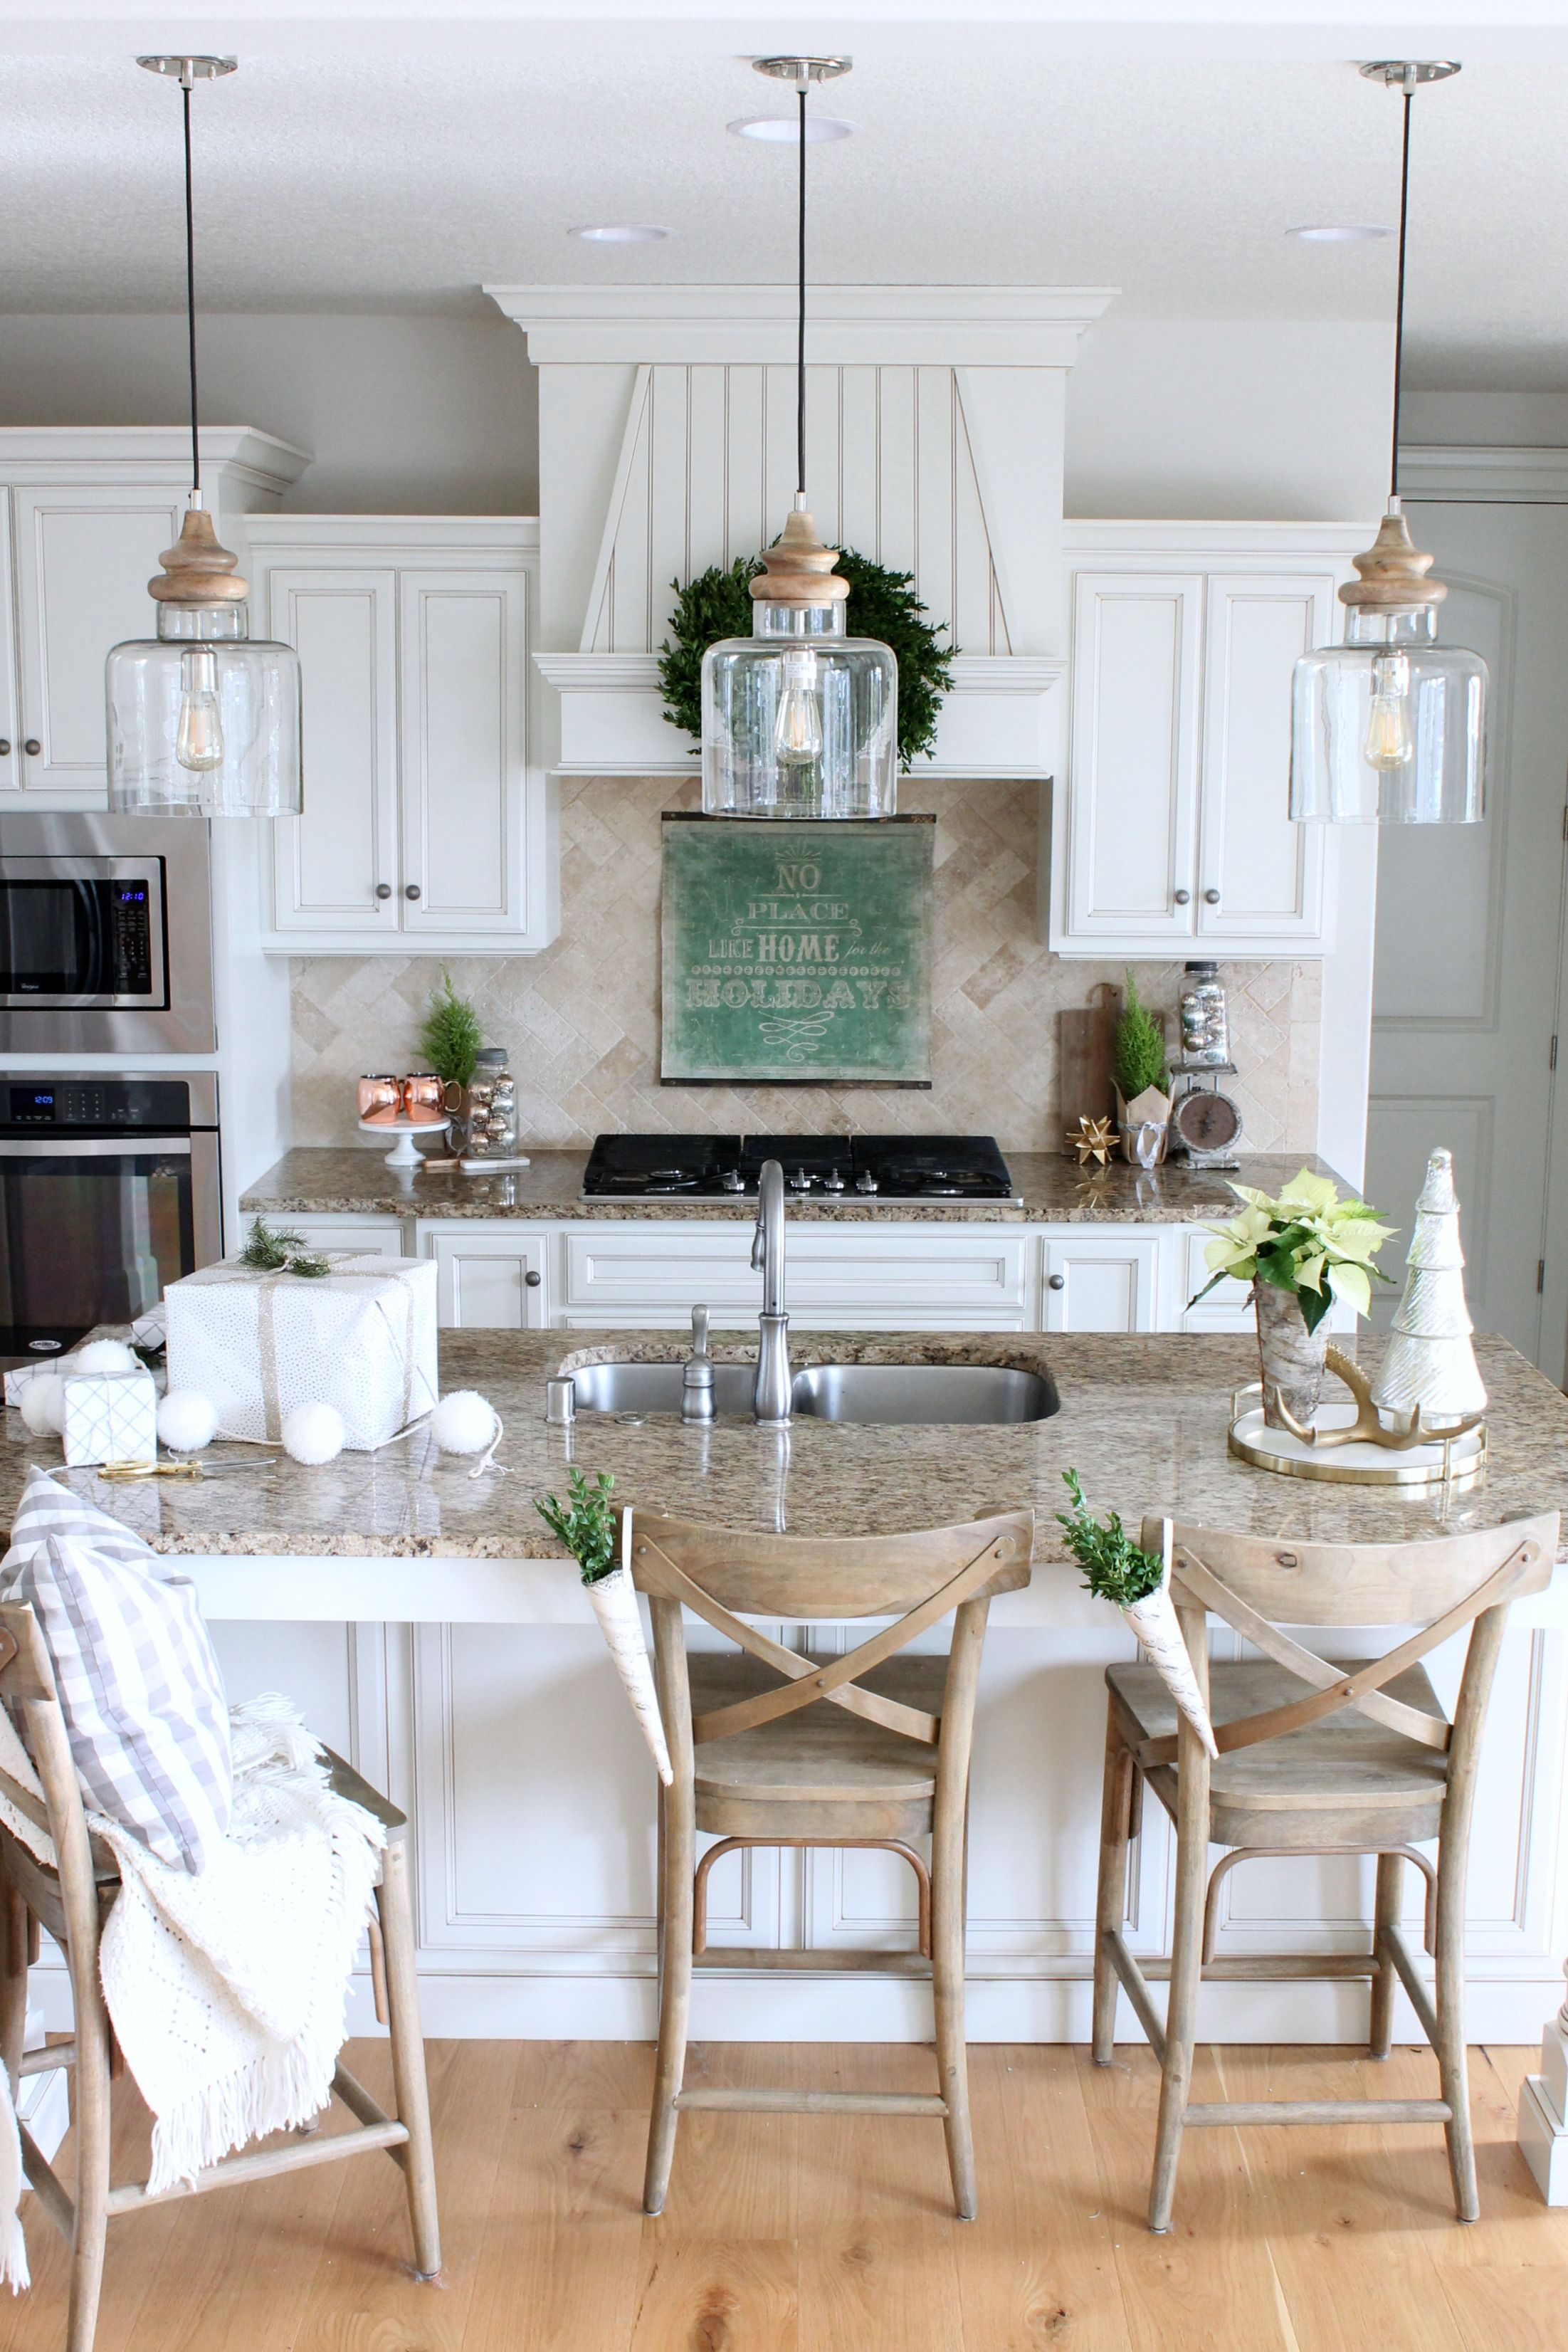 Modern Farmhouse Kitchen Island Pendants Http Www Chiccalifornia Com